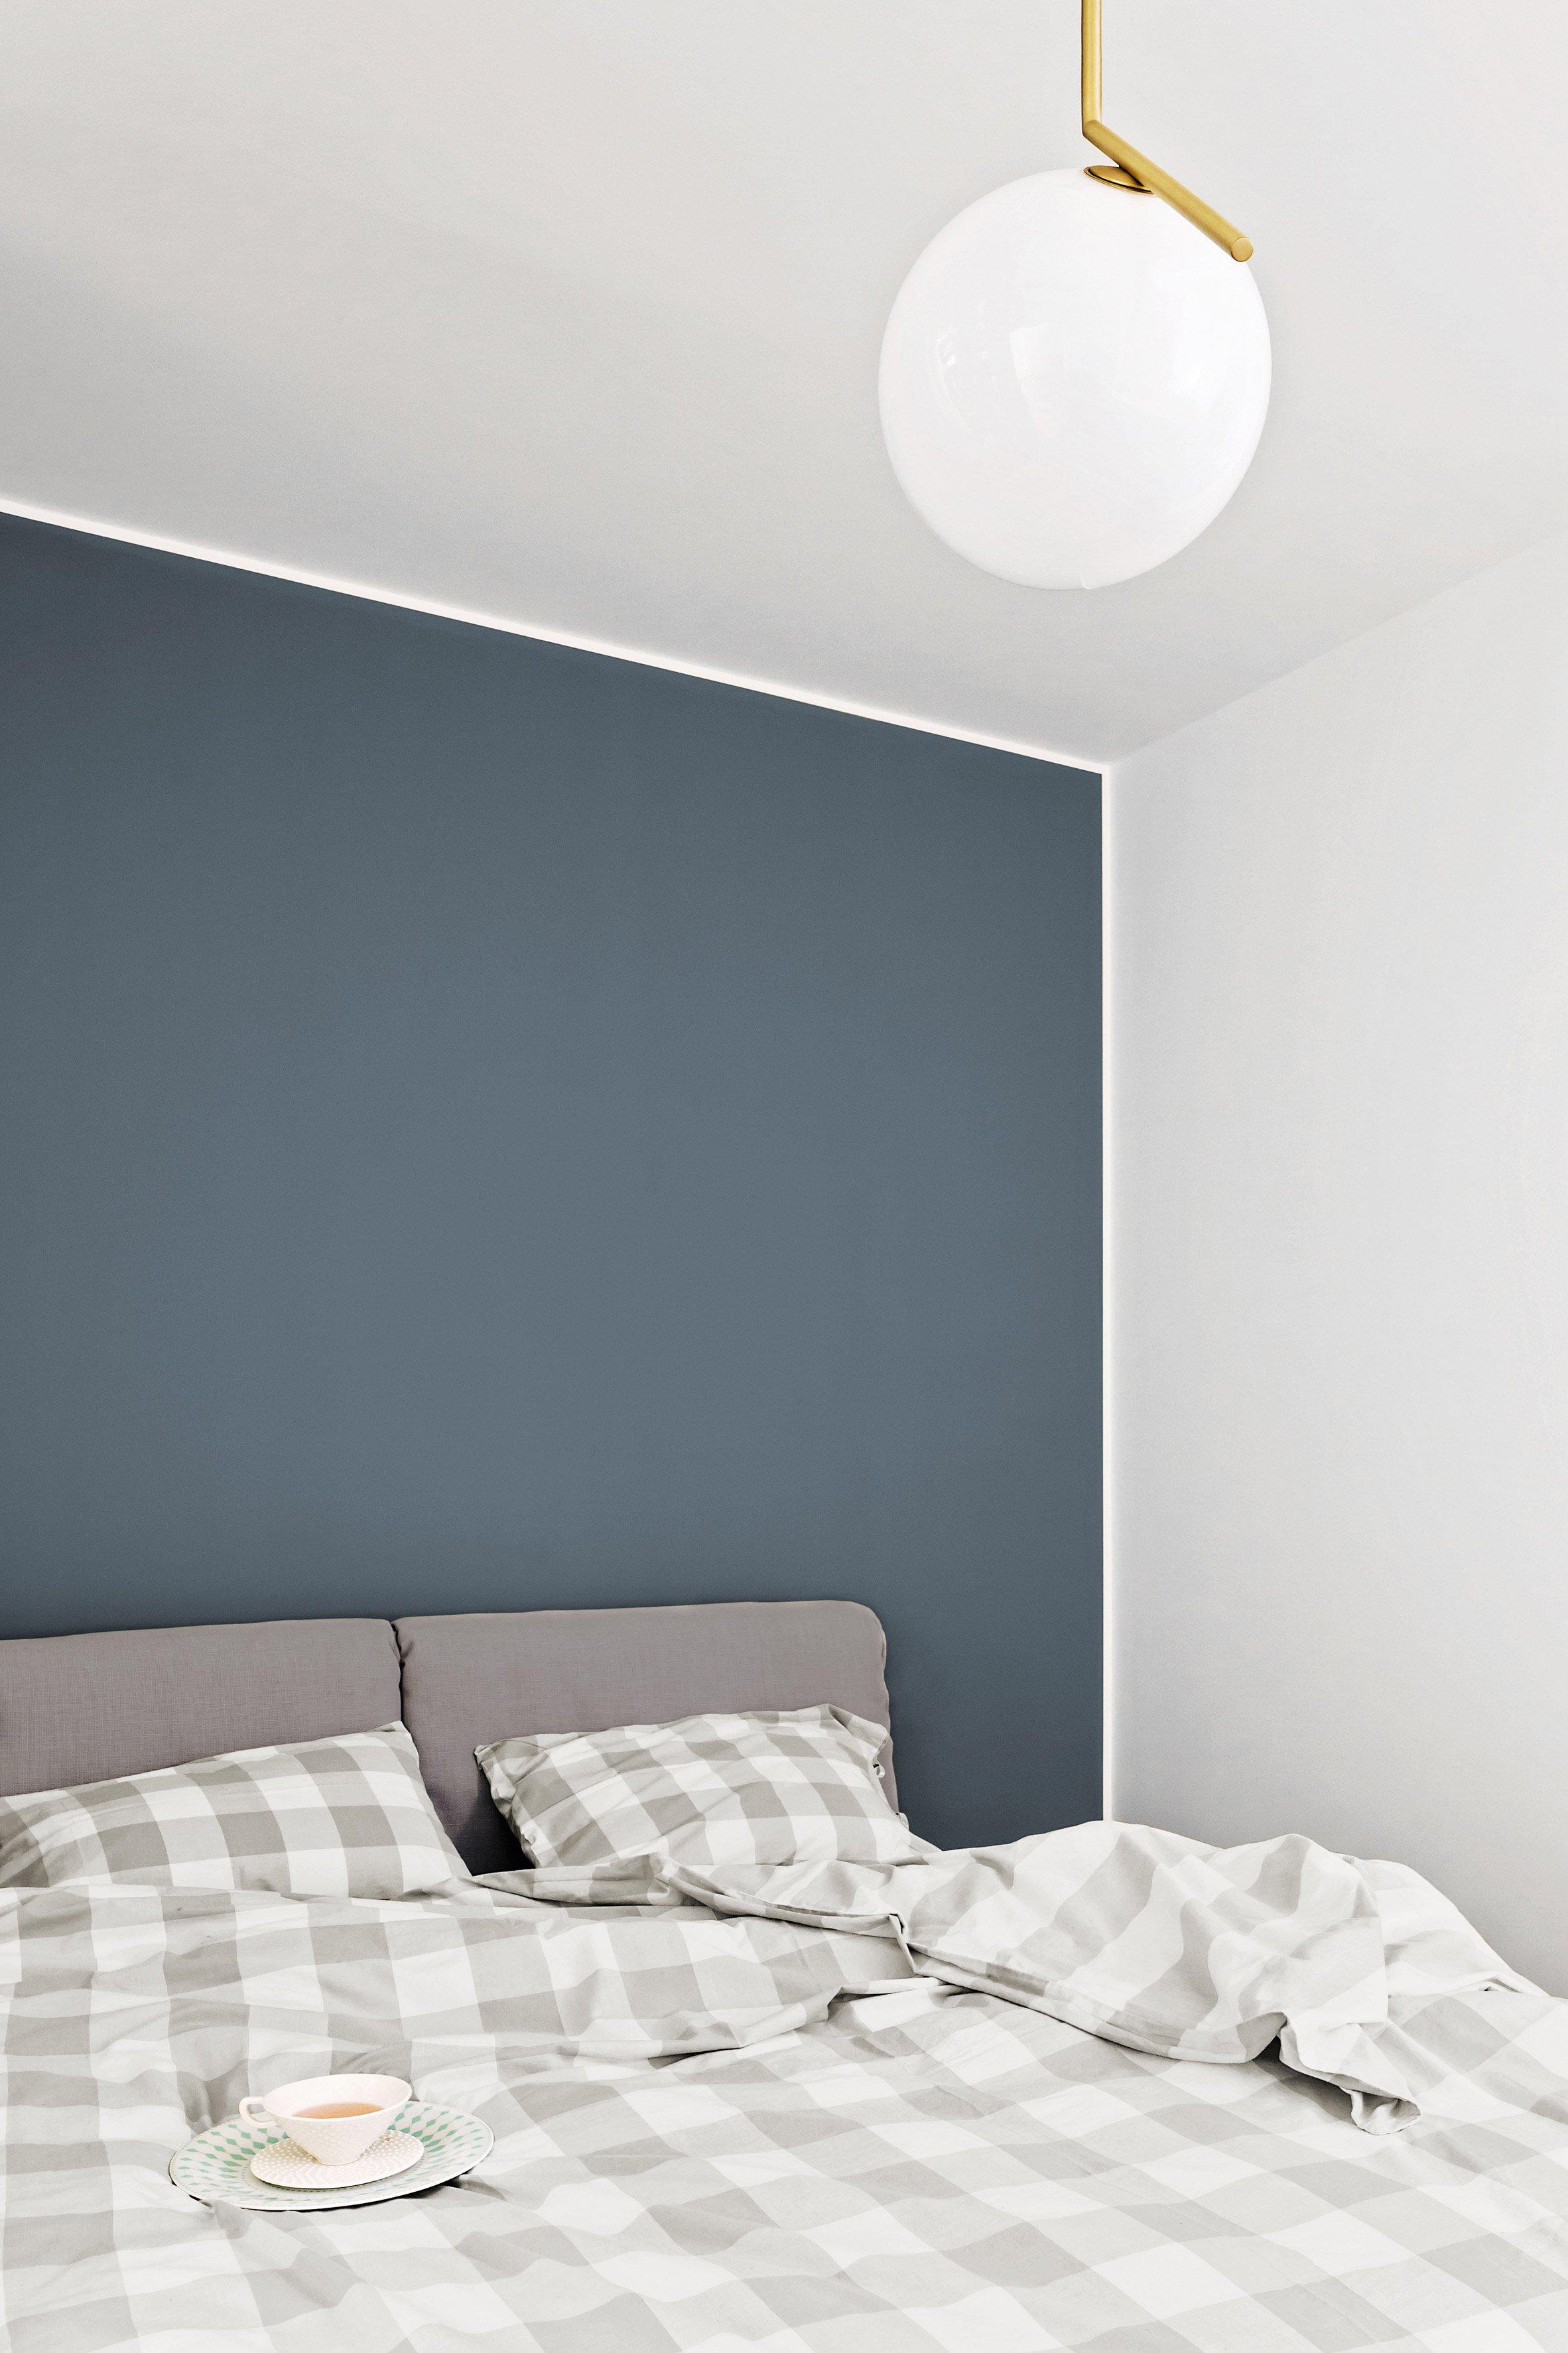 architecture-house-residential-design-studia-interiors-osnovadesign-osnova-poltava_10